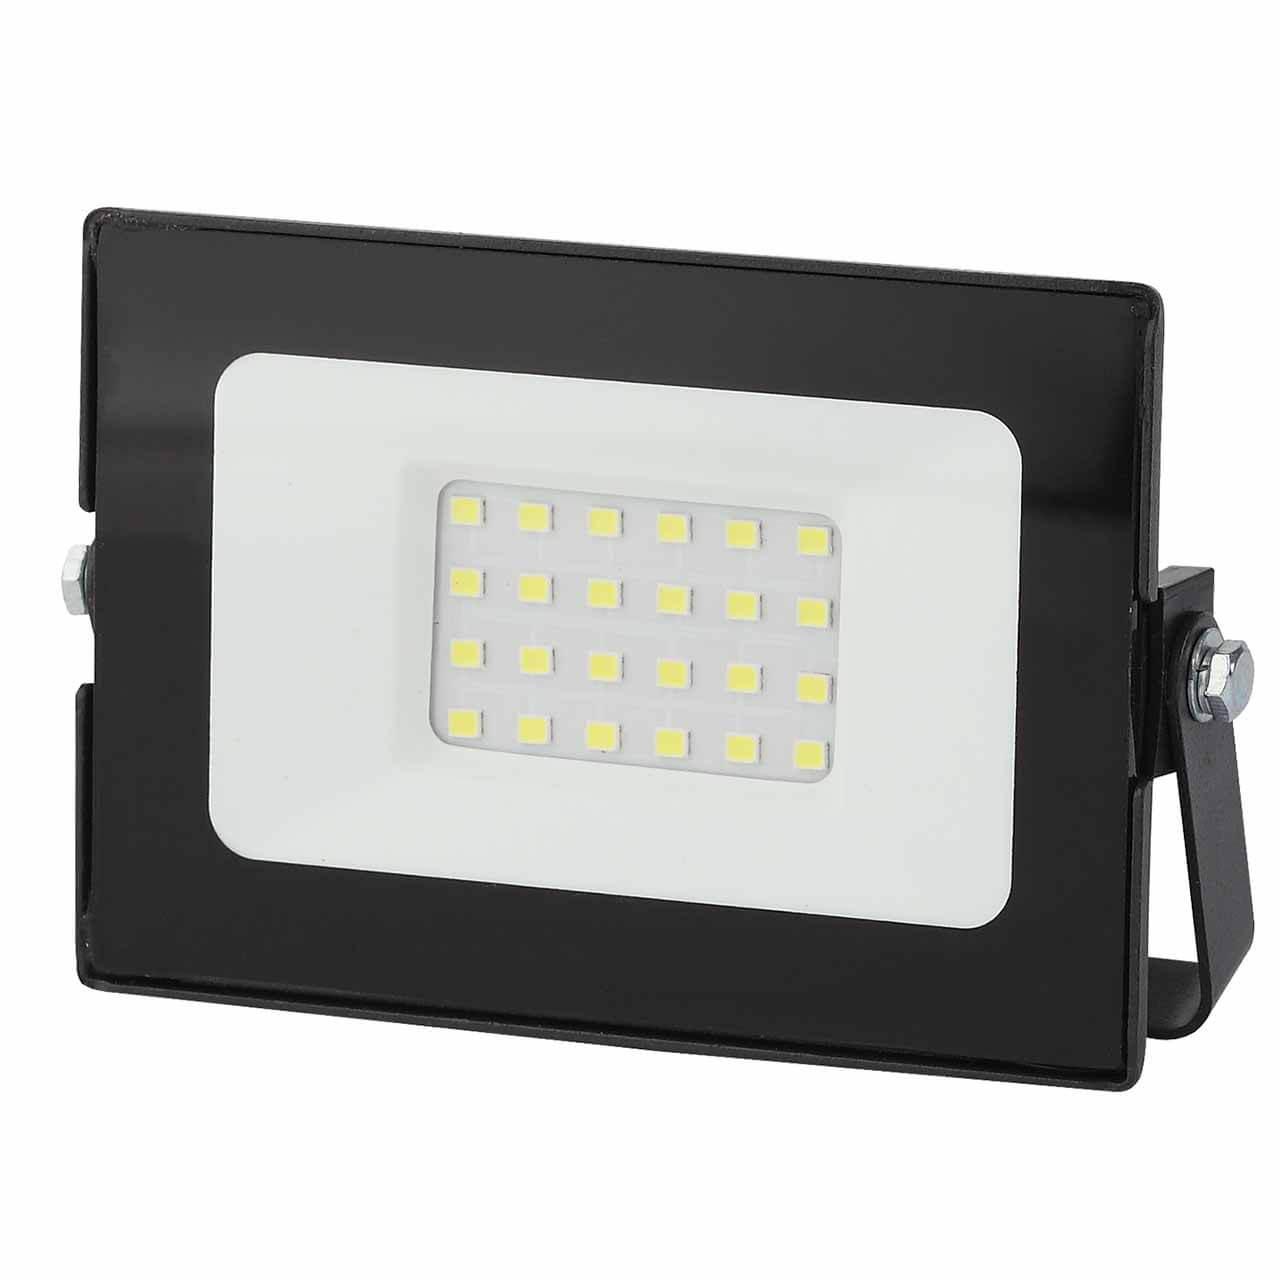 Прожектор ЭРА LPR-021-0-65K-020 PR-021